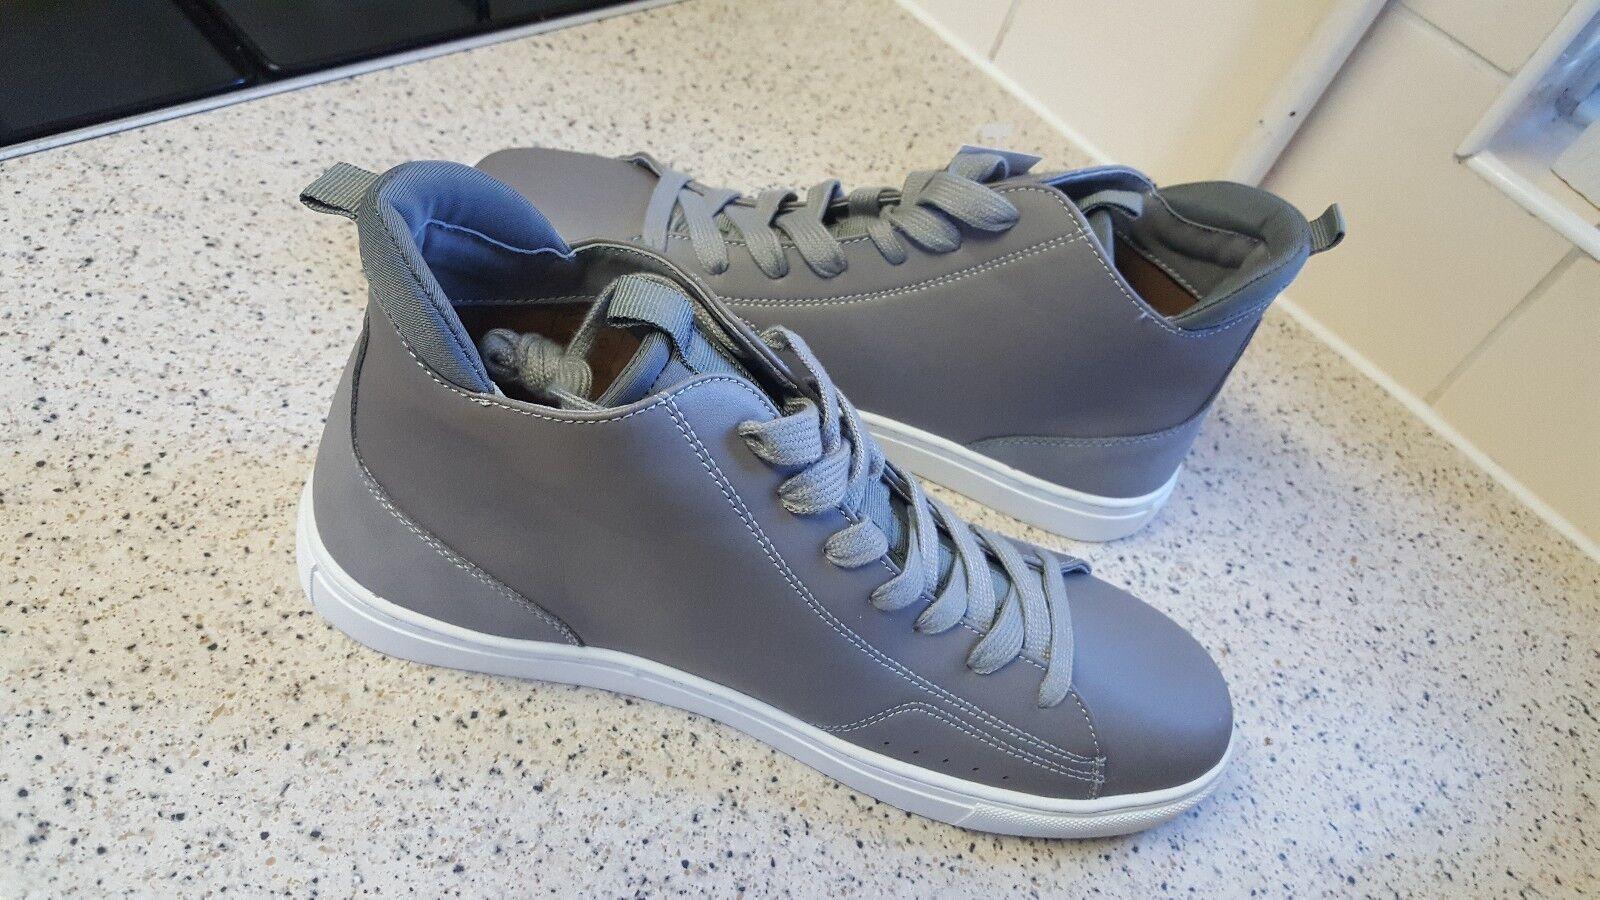 Topman (New) Grey Wings High Top Size UK 9  Euro 43